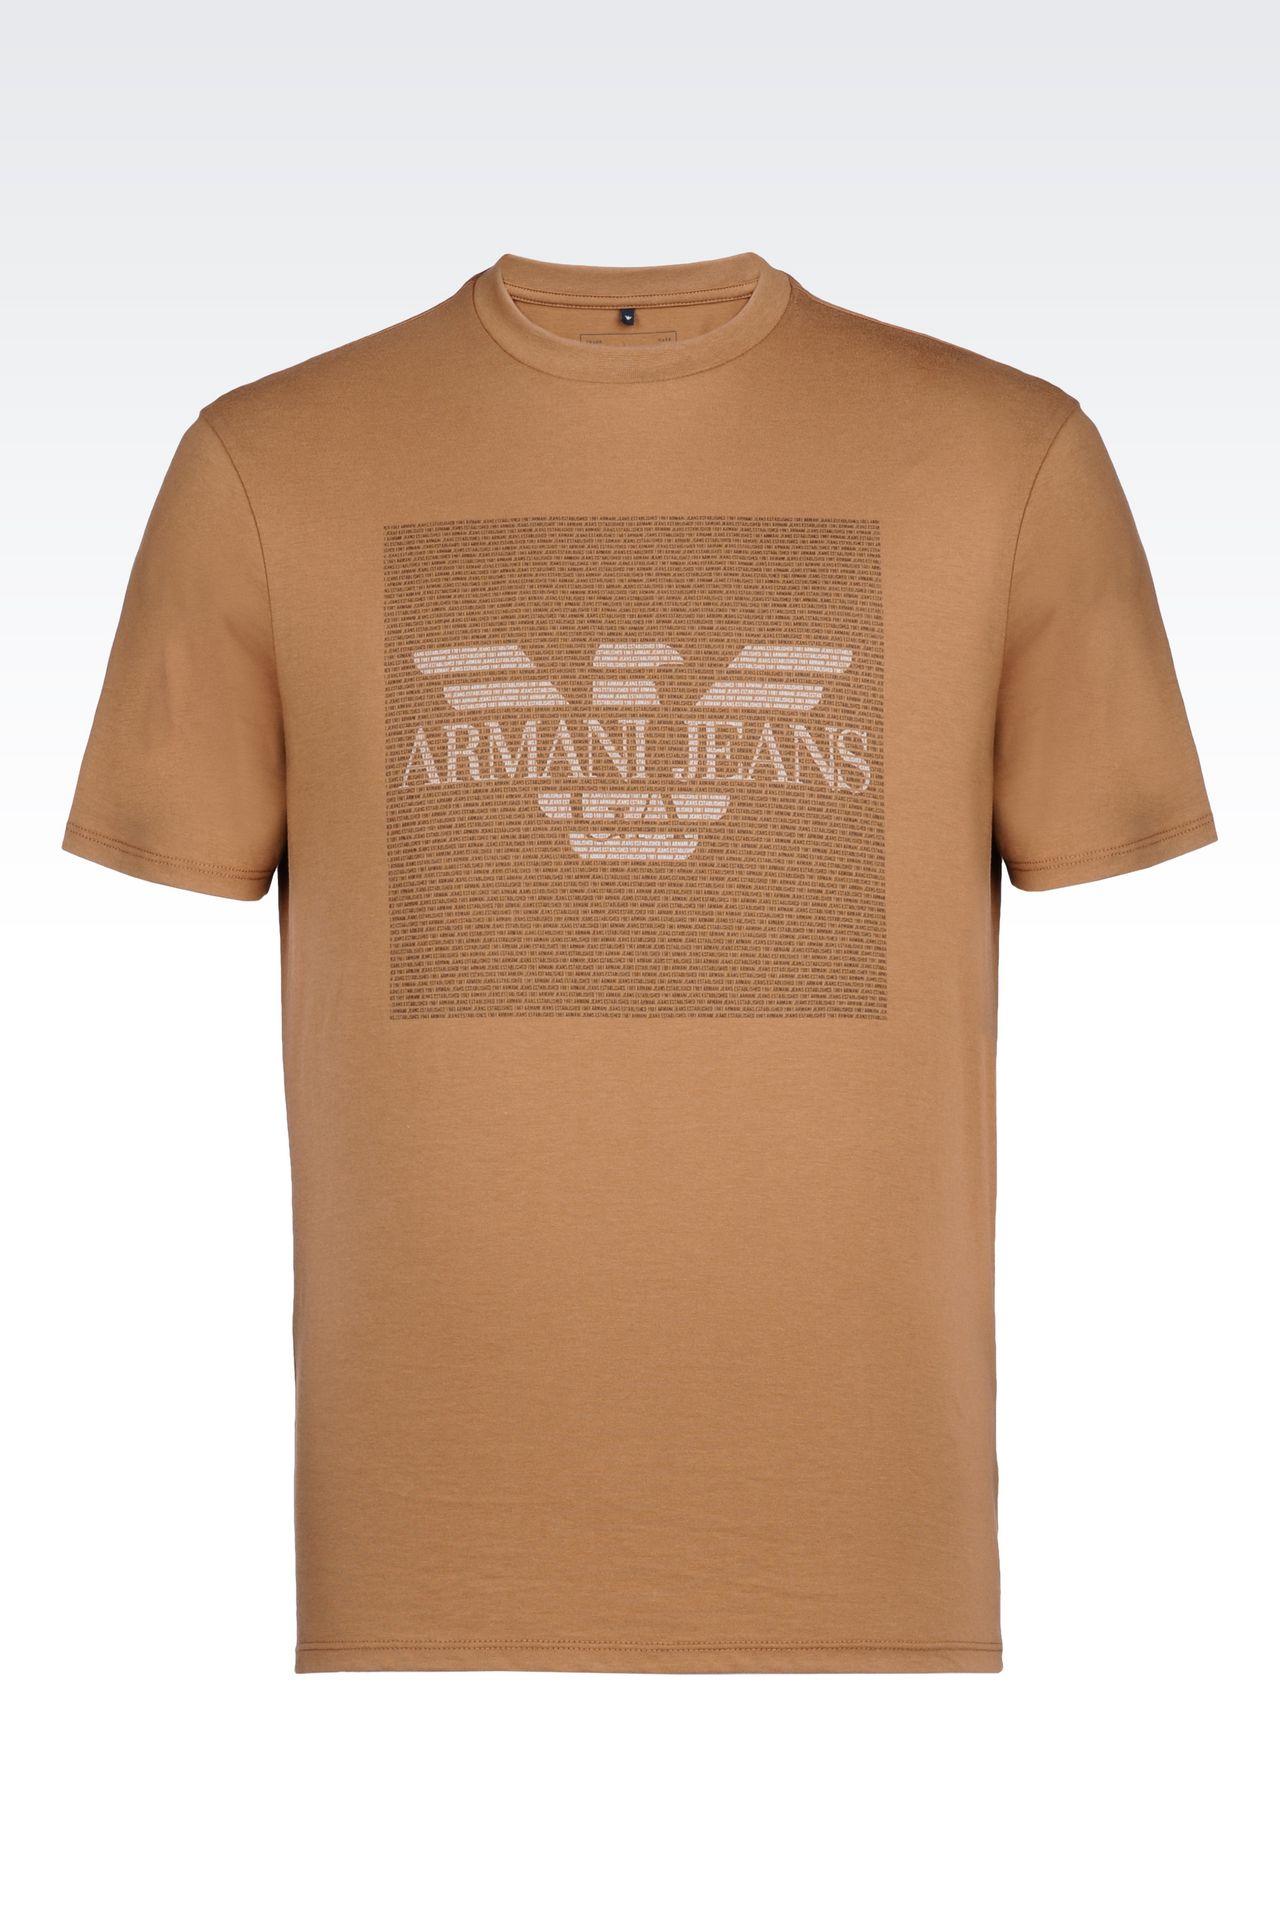 armani jeans men jersey t shirt cotton. Black Bedroom Furniture Sets. Home Design Ideas